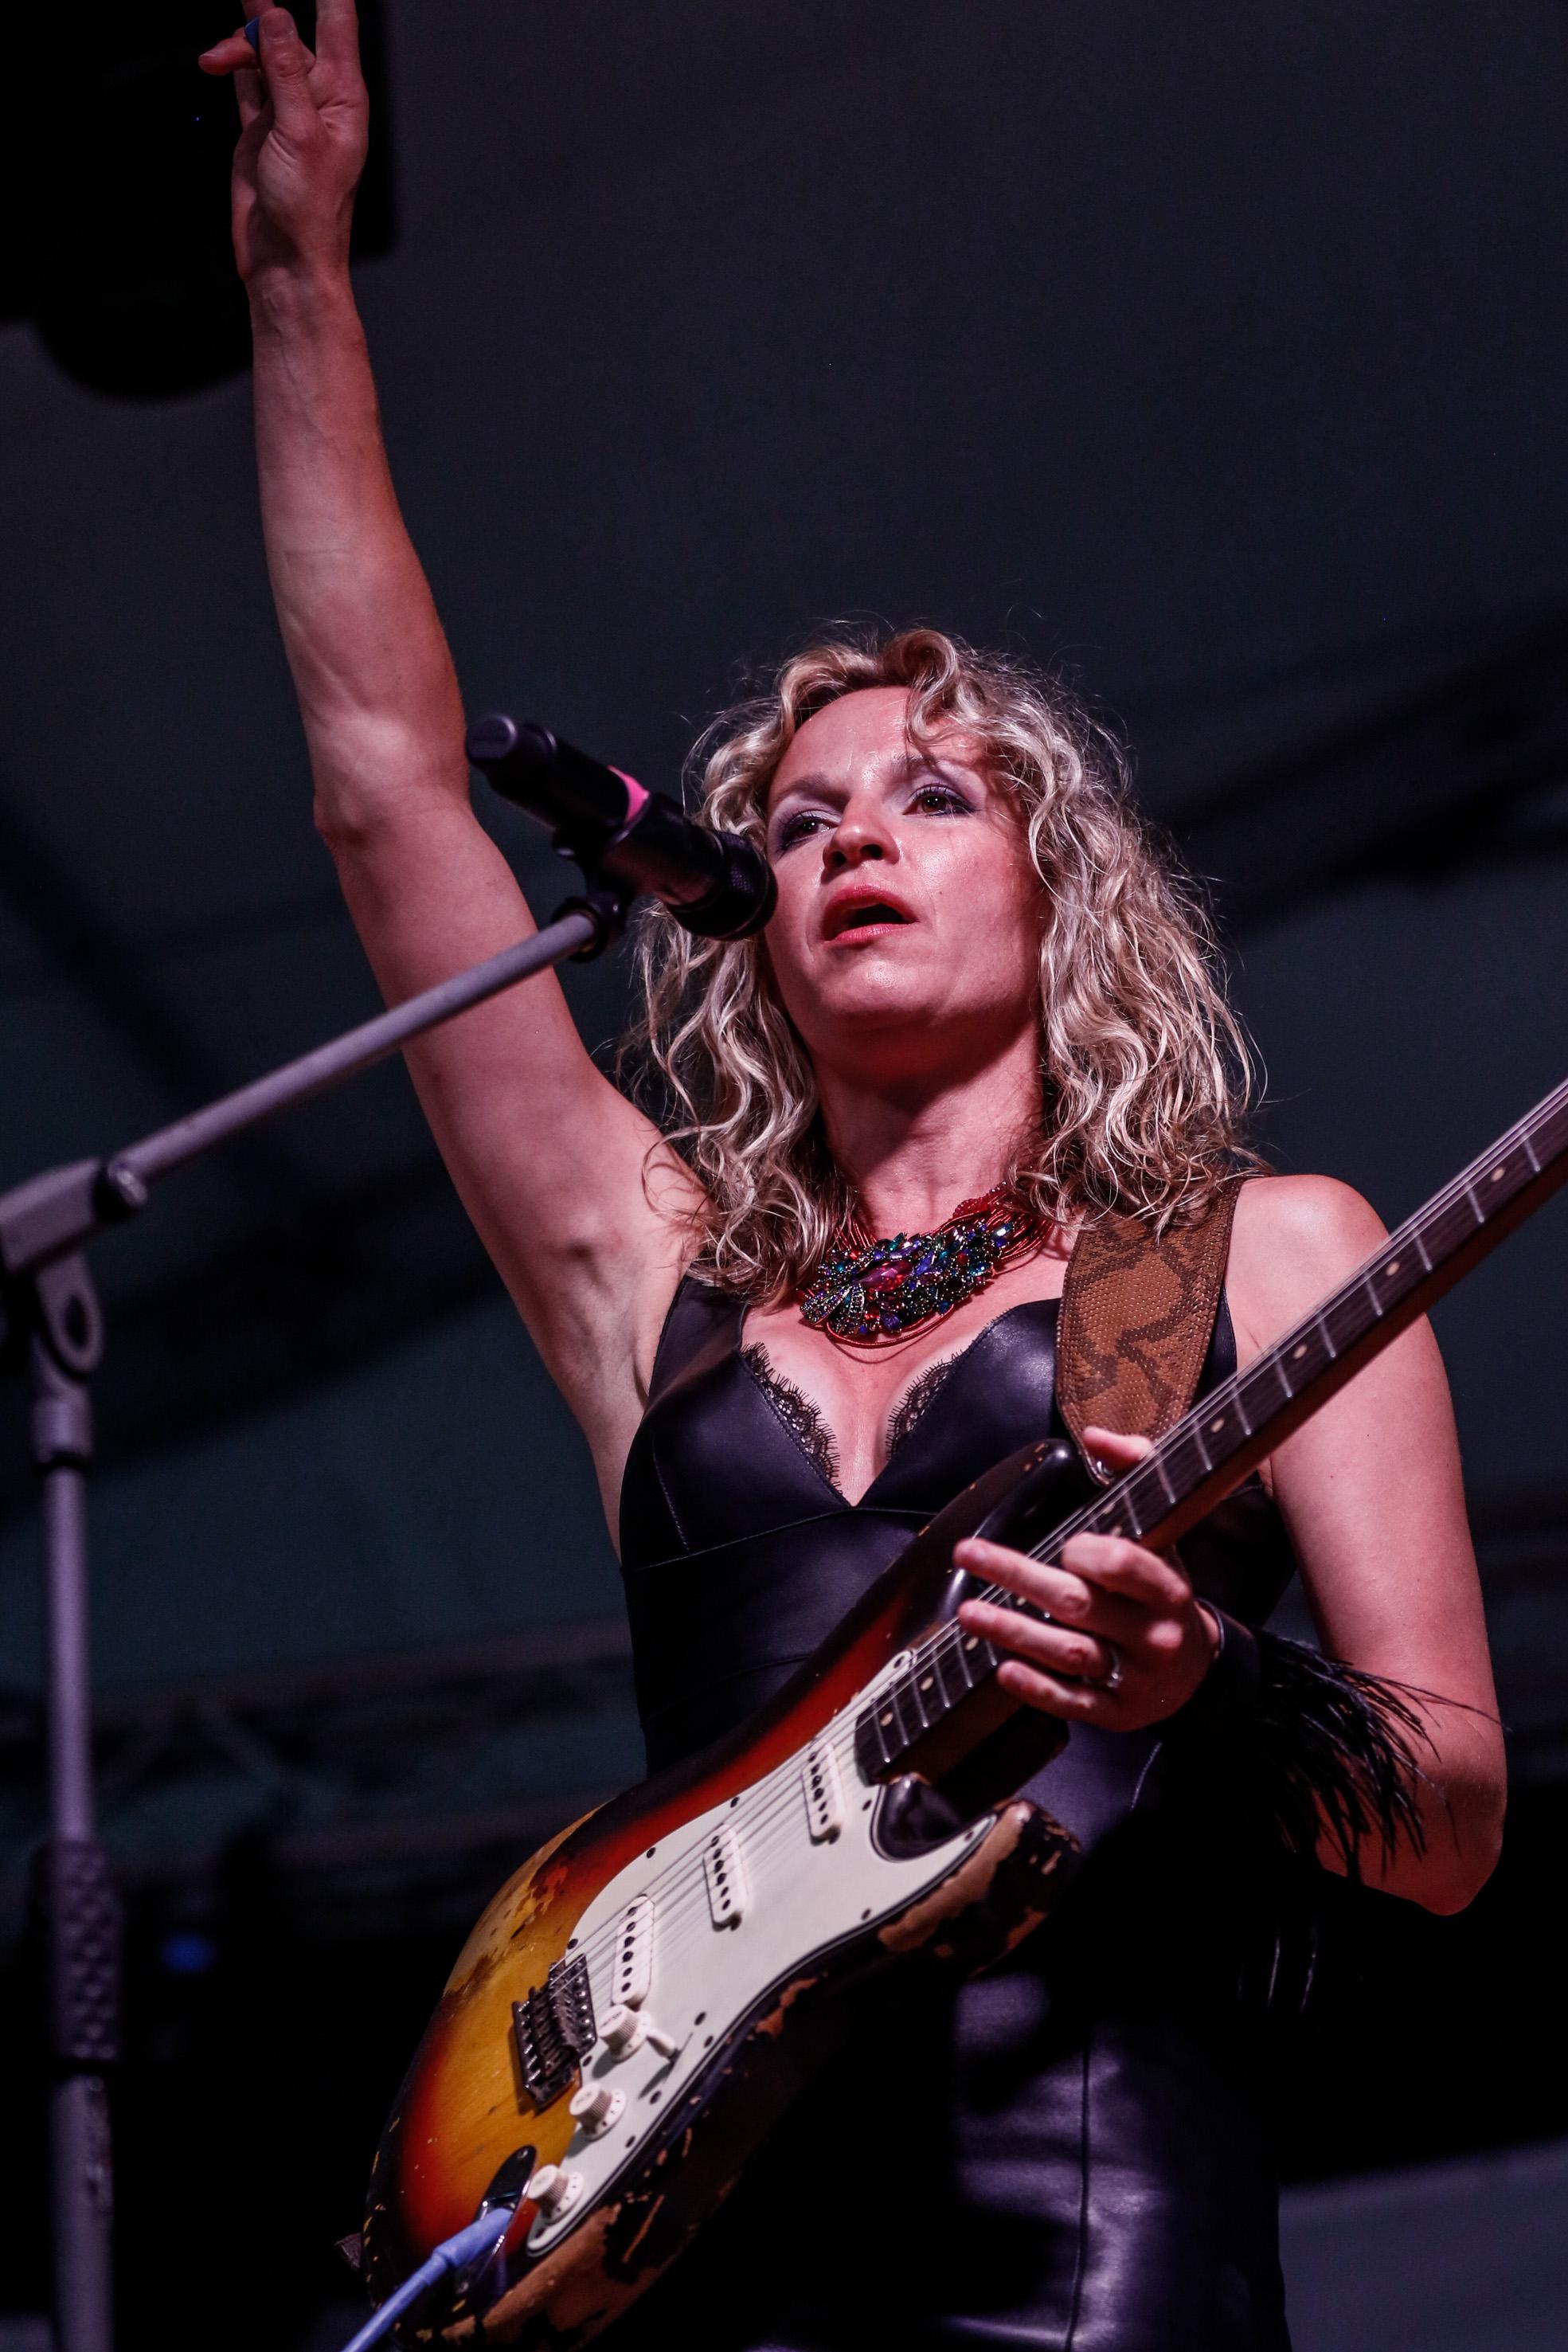 Ana Popovic – Chiari Blues Festival 2019